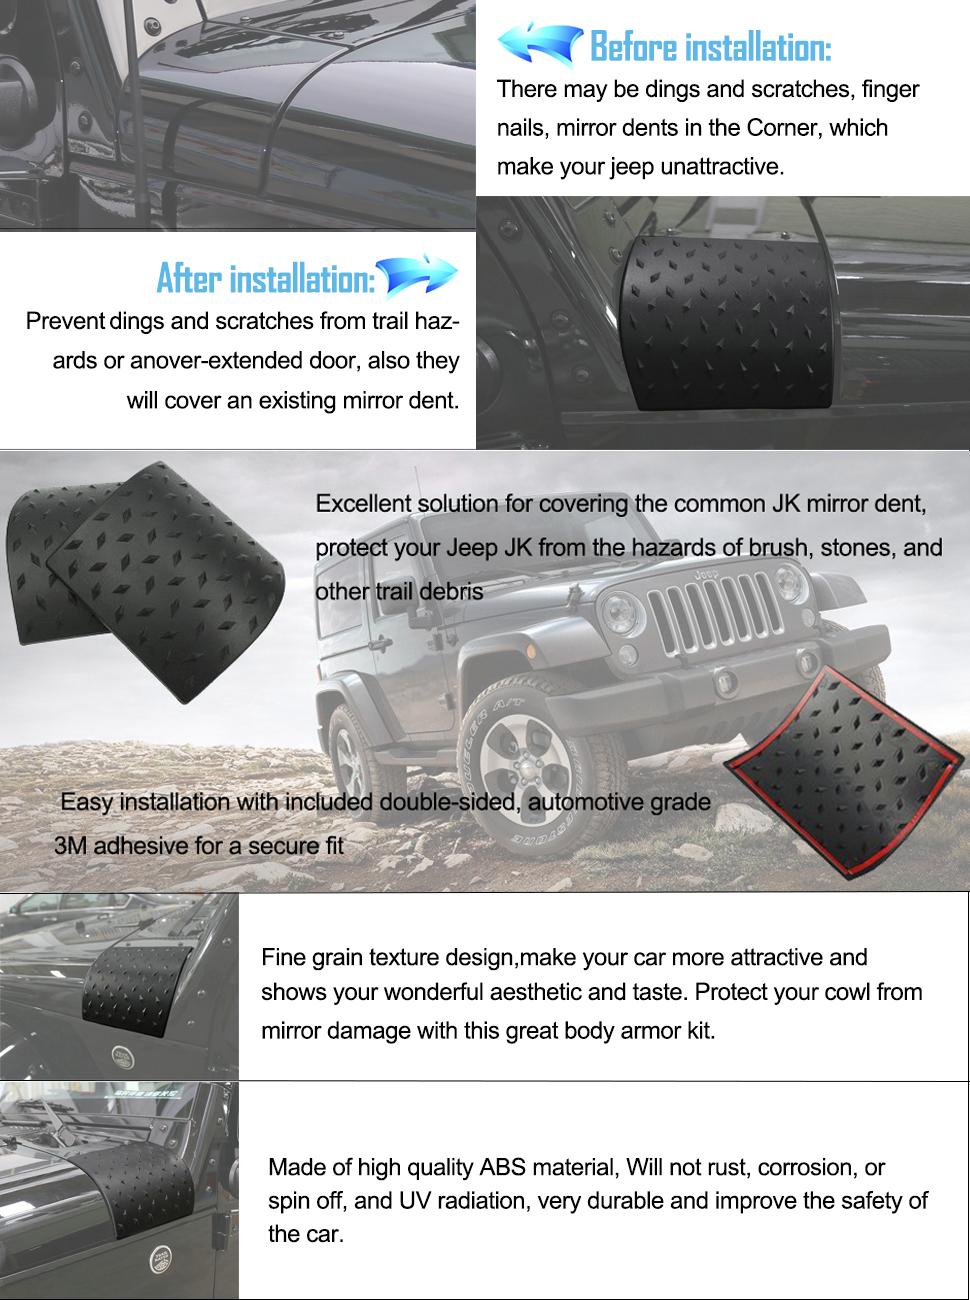 Exterior Car Part Names: Amazon.com: Danti Black Cowl Body Armor Outer Cowling